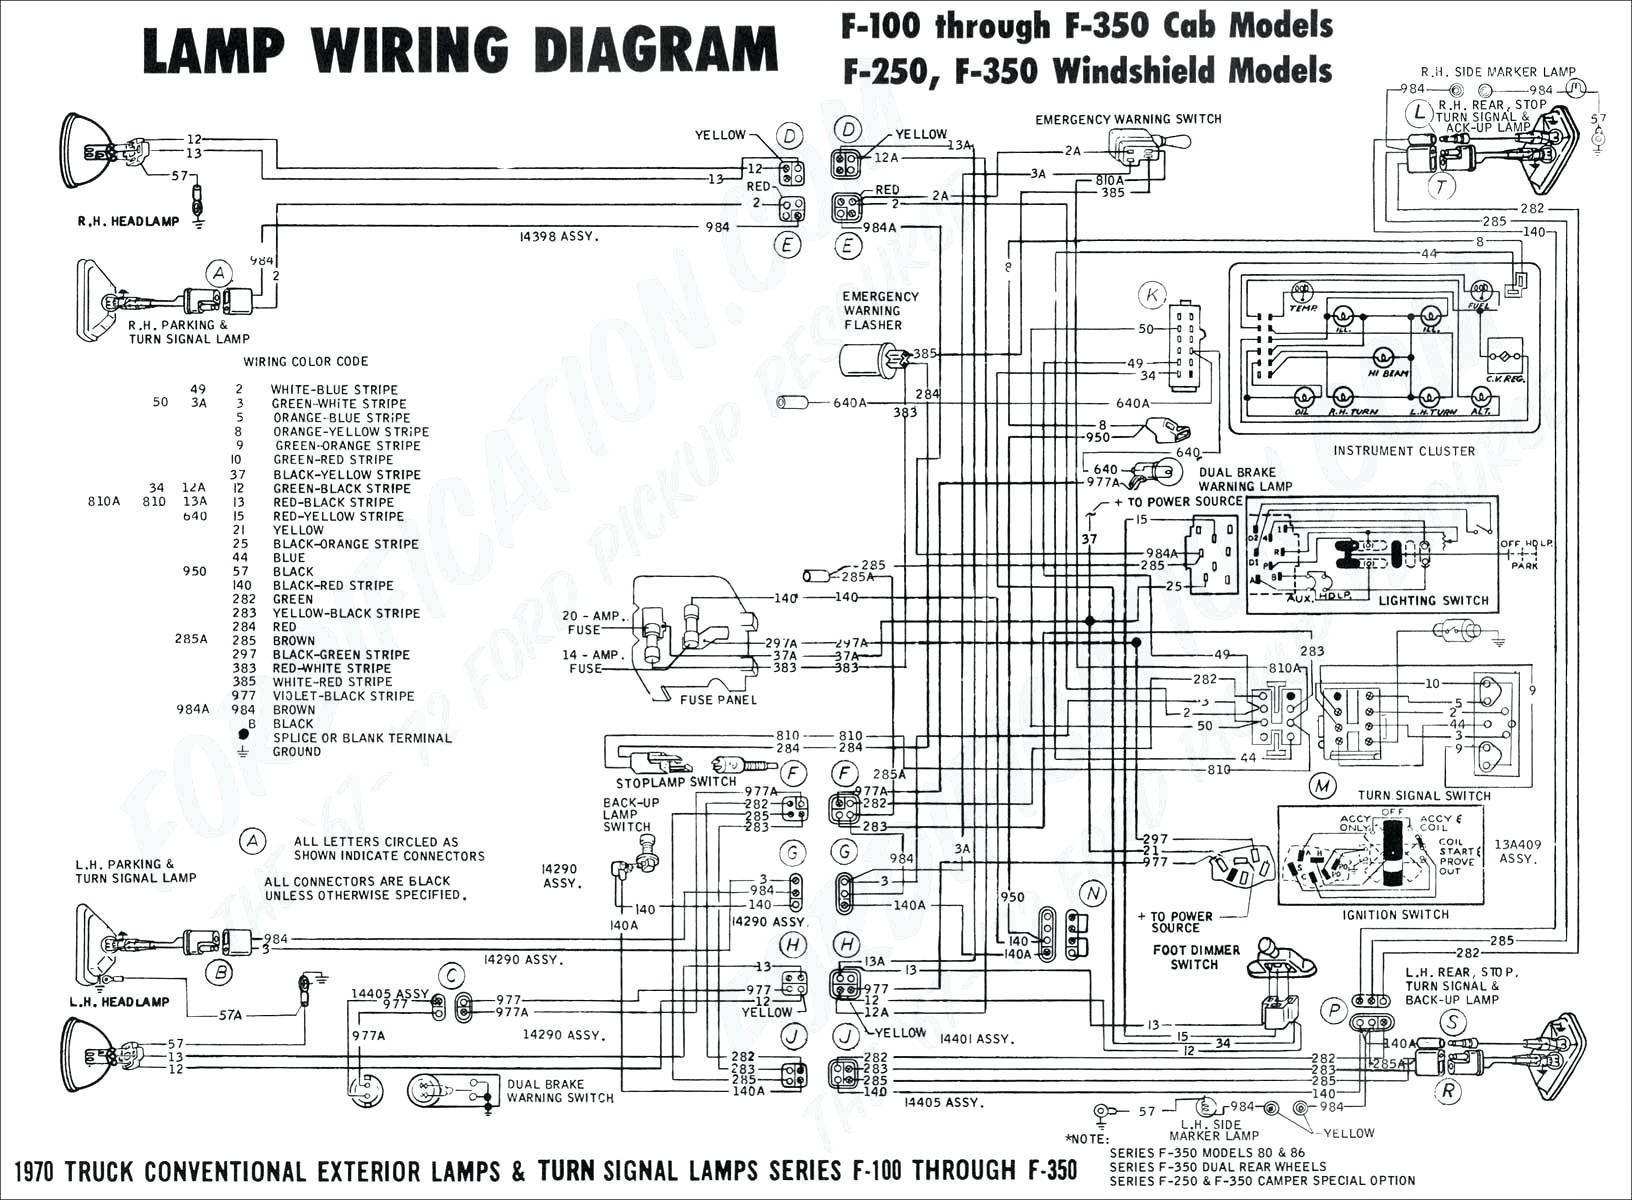 x5 trailer wiring diagram wiring diagram bmw x5 trailer wiring diagram